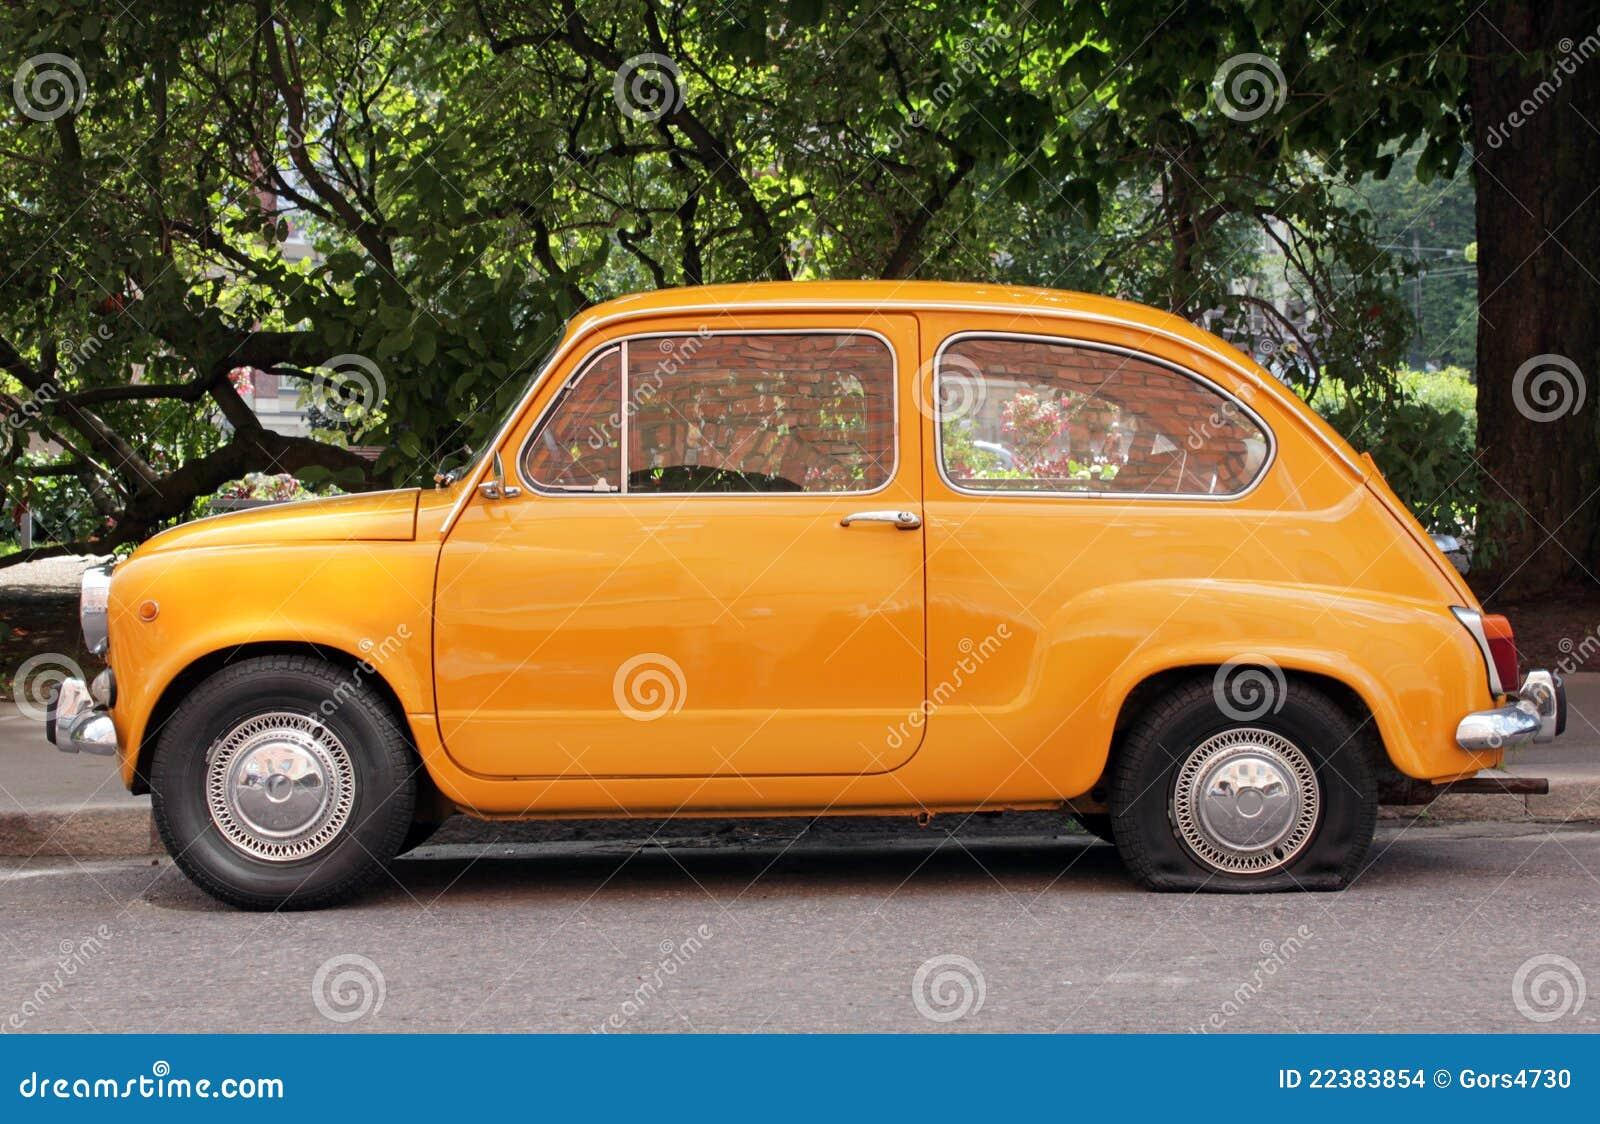 Old Car Stock Photo. Image Of Elderly, Side, Europa